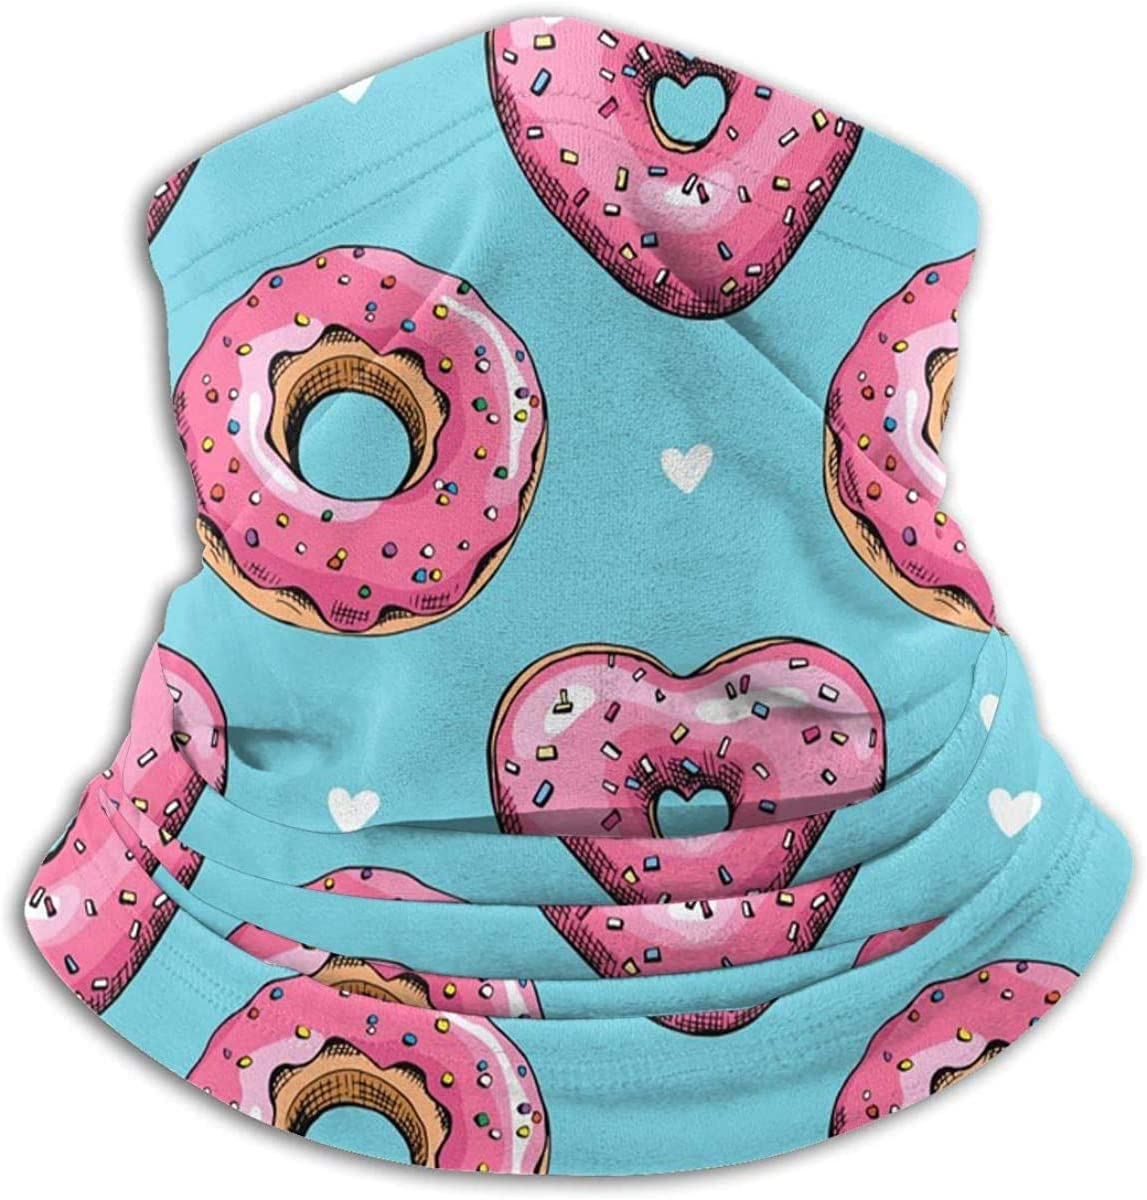 Lastbest Pink Heart Donuts Neck Warmer Multifunction Scarf Hat Neck Gaiter Neck Cap Bala Windproof Neck Heating Wrap Outdoor Sports One Size